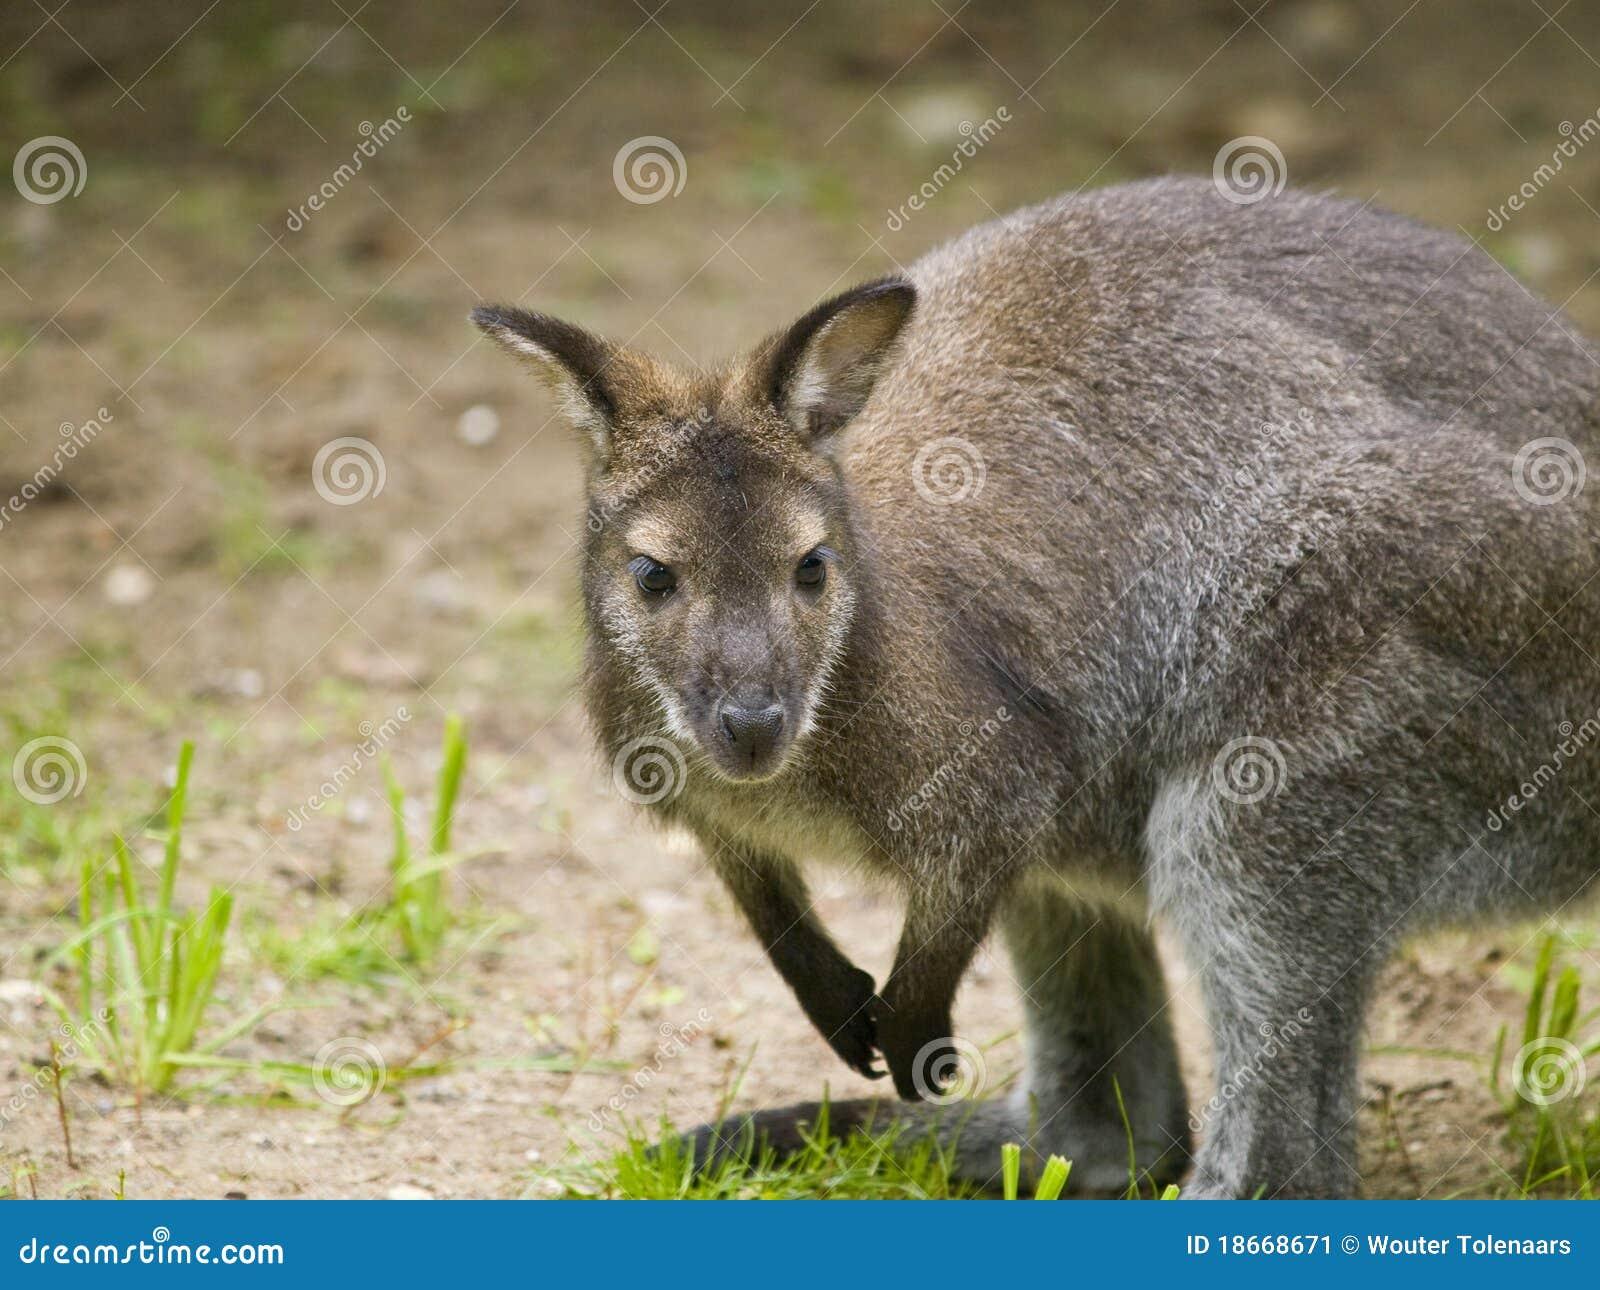 Small Kangaroo Stock Image Image Of Looking Creature